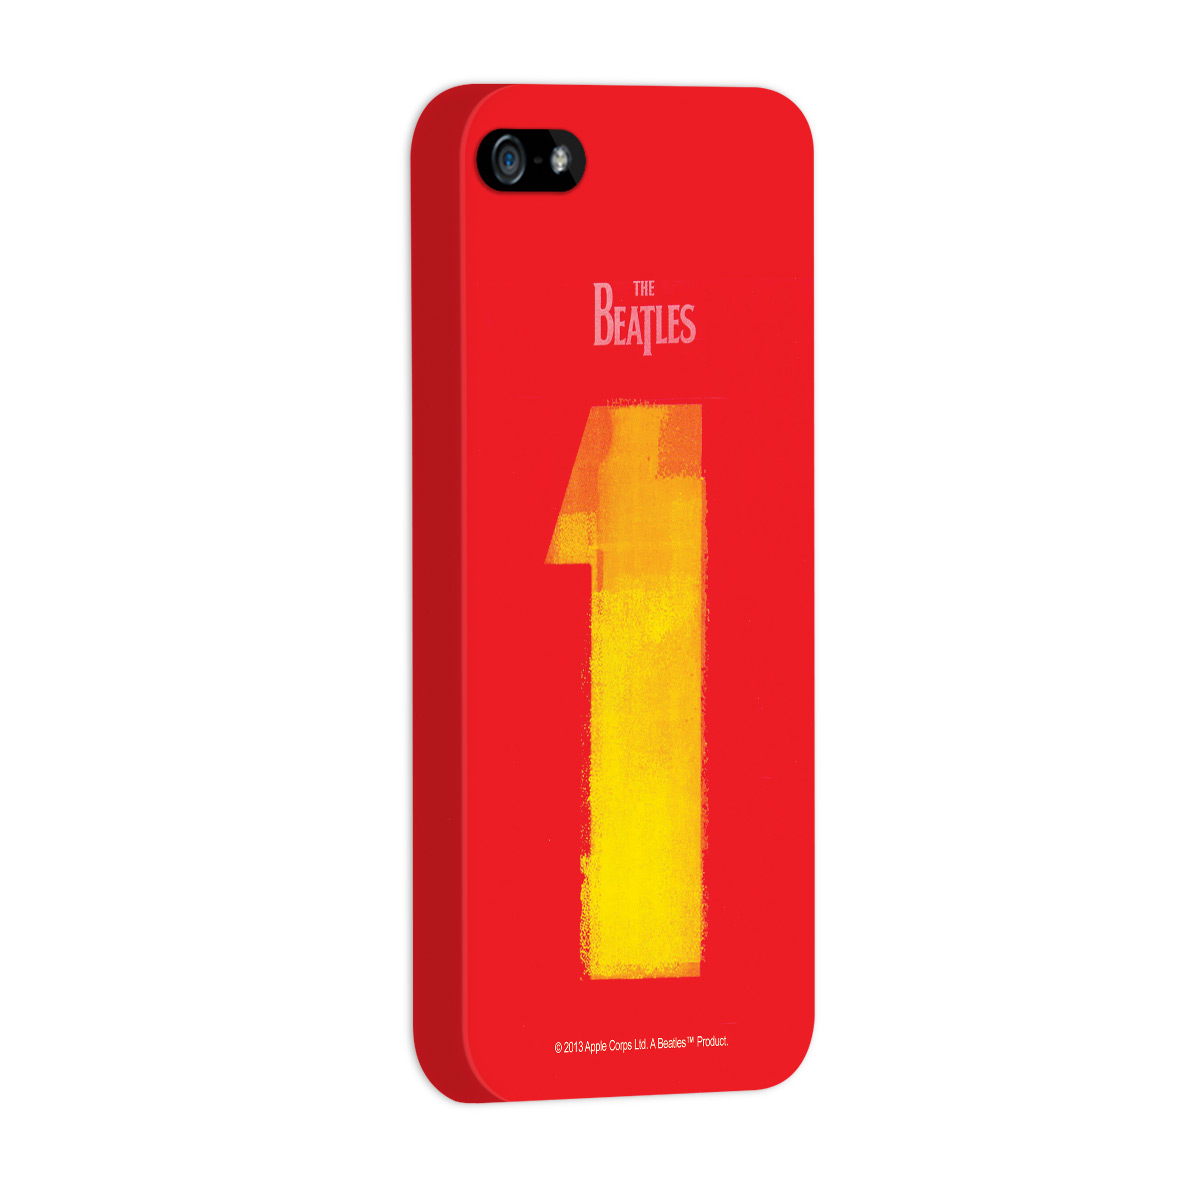 Capa de iPhone 5/5S The Beatles One